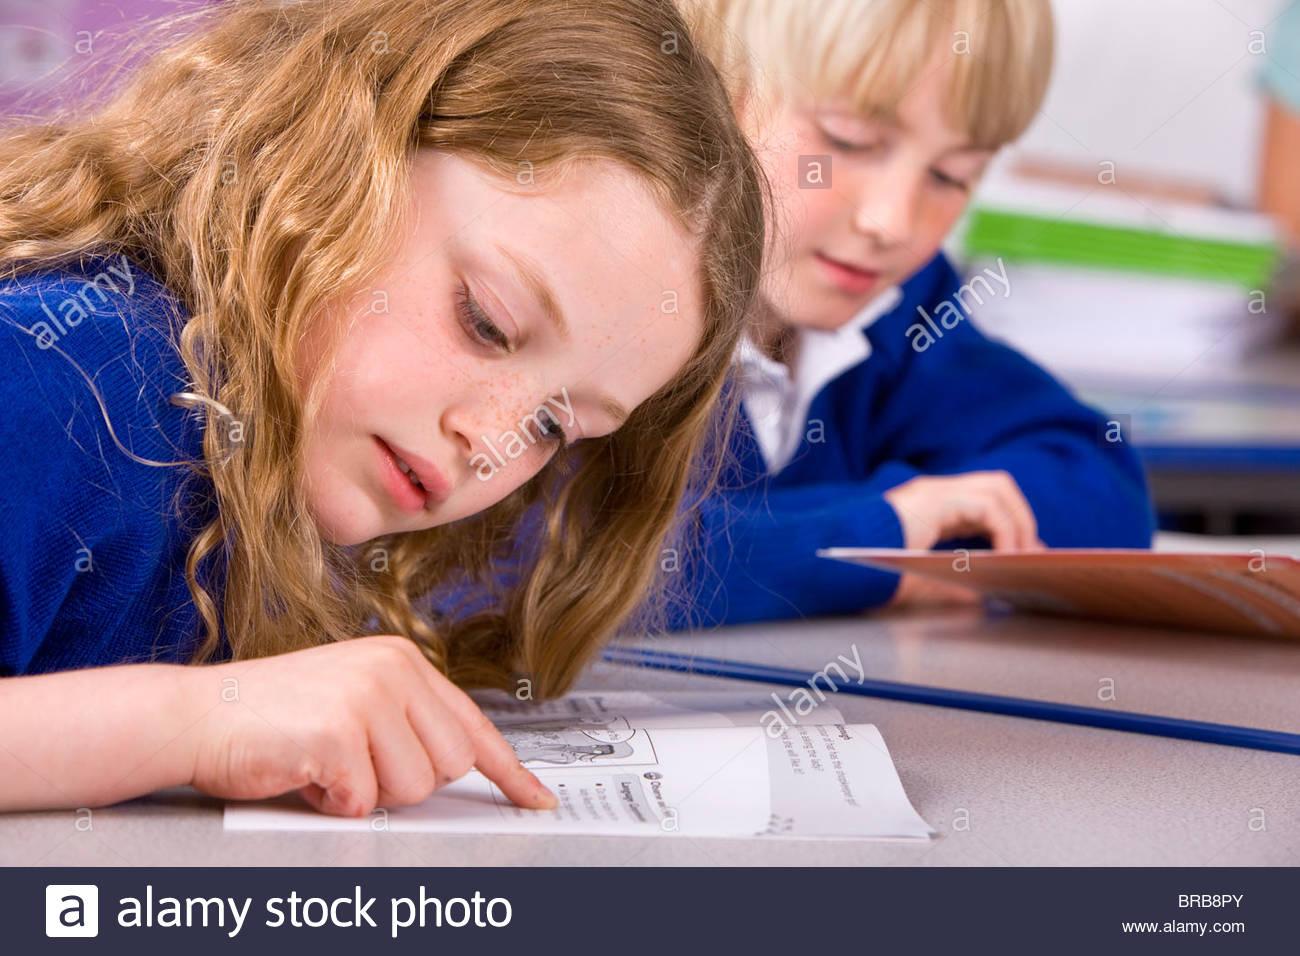 School girl reading workbook in classroom - Stock Image